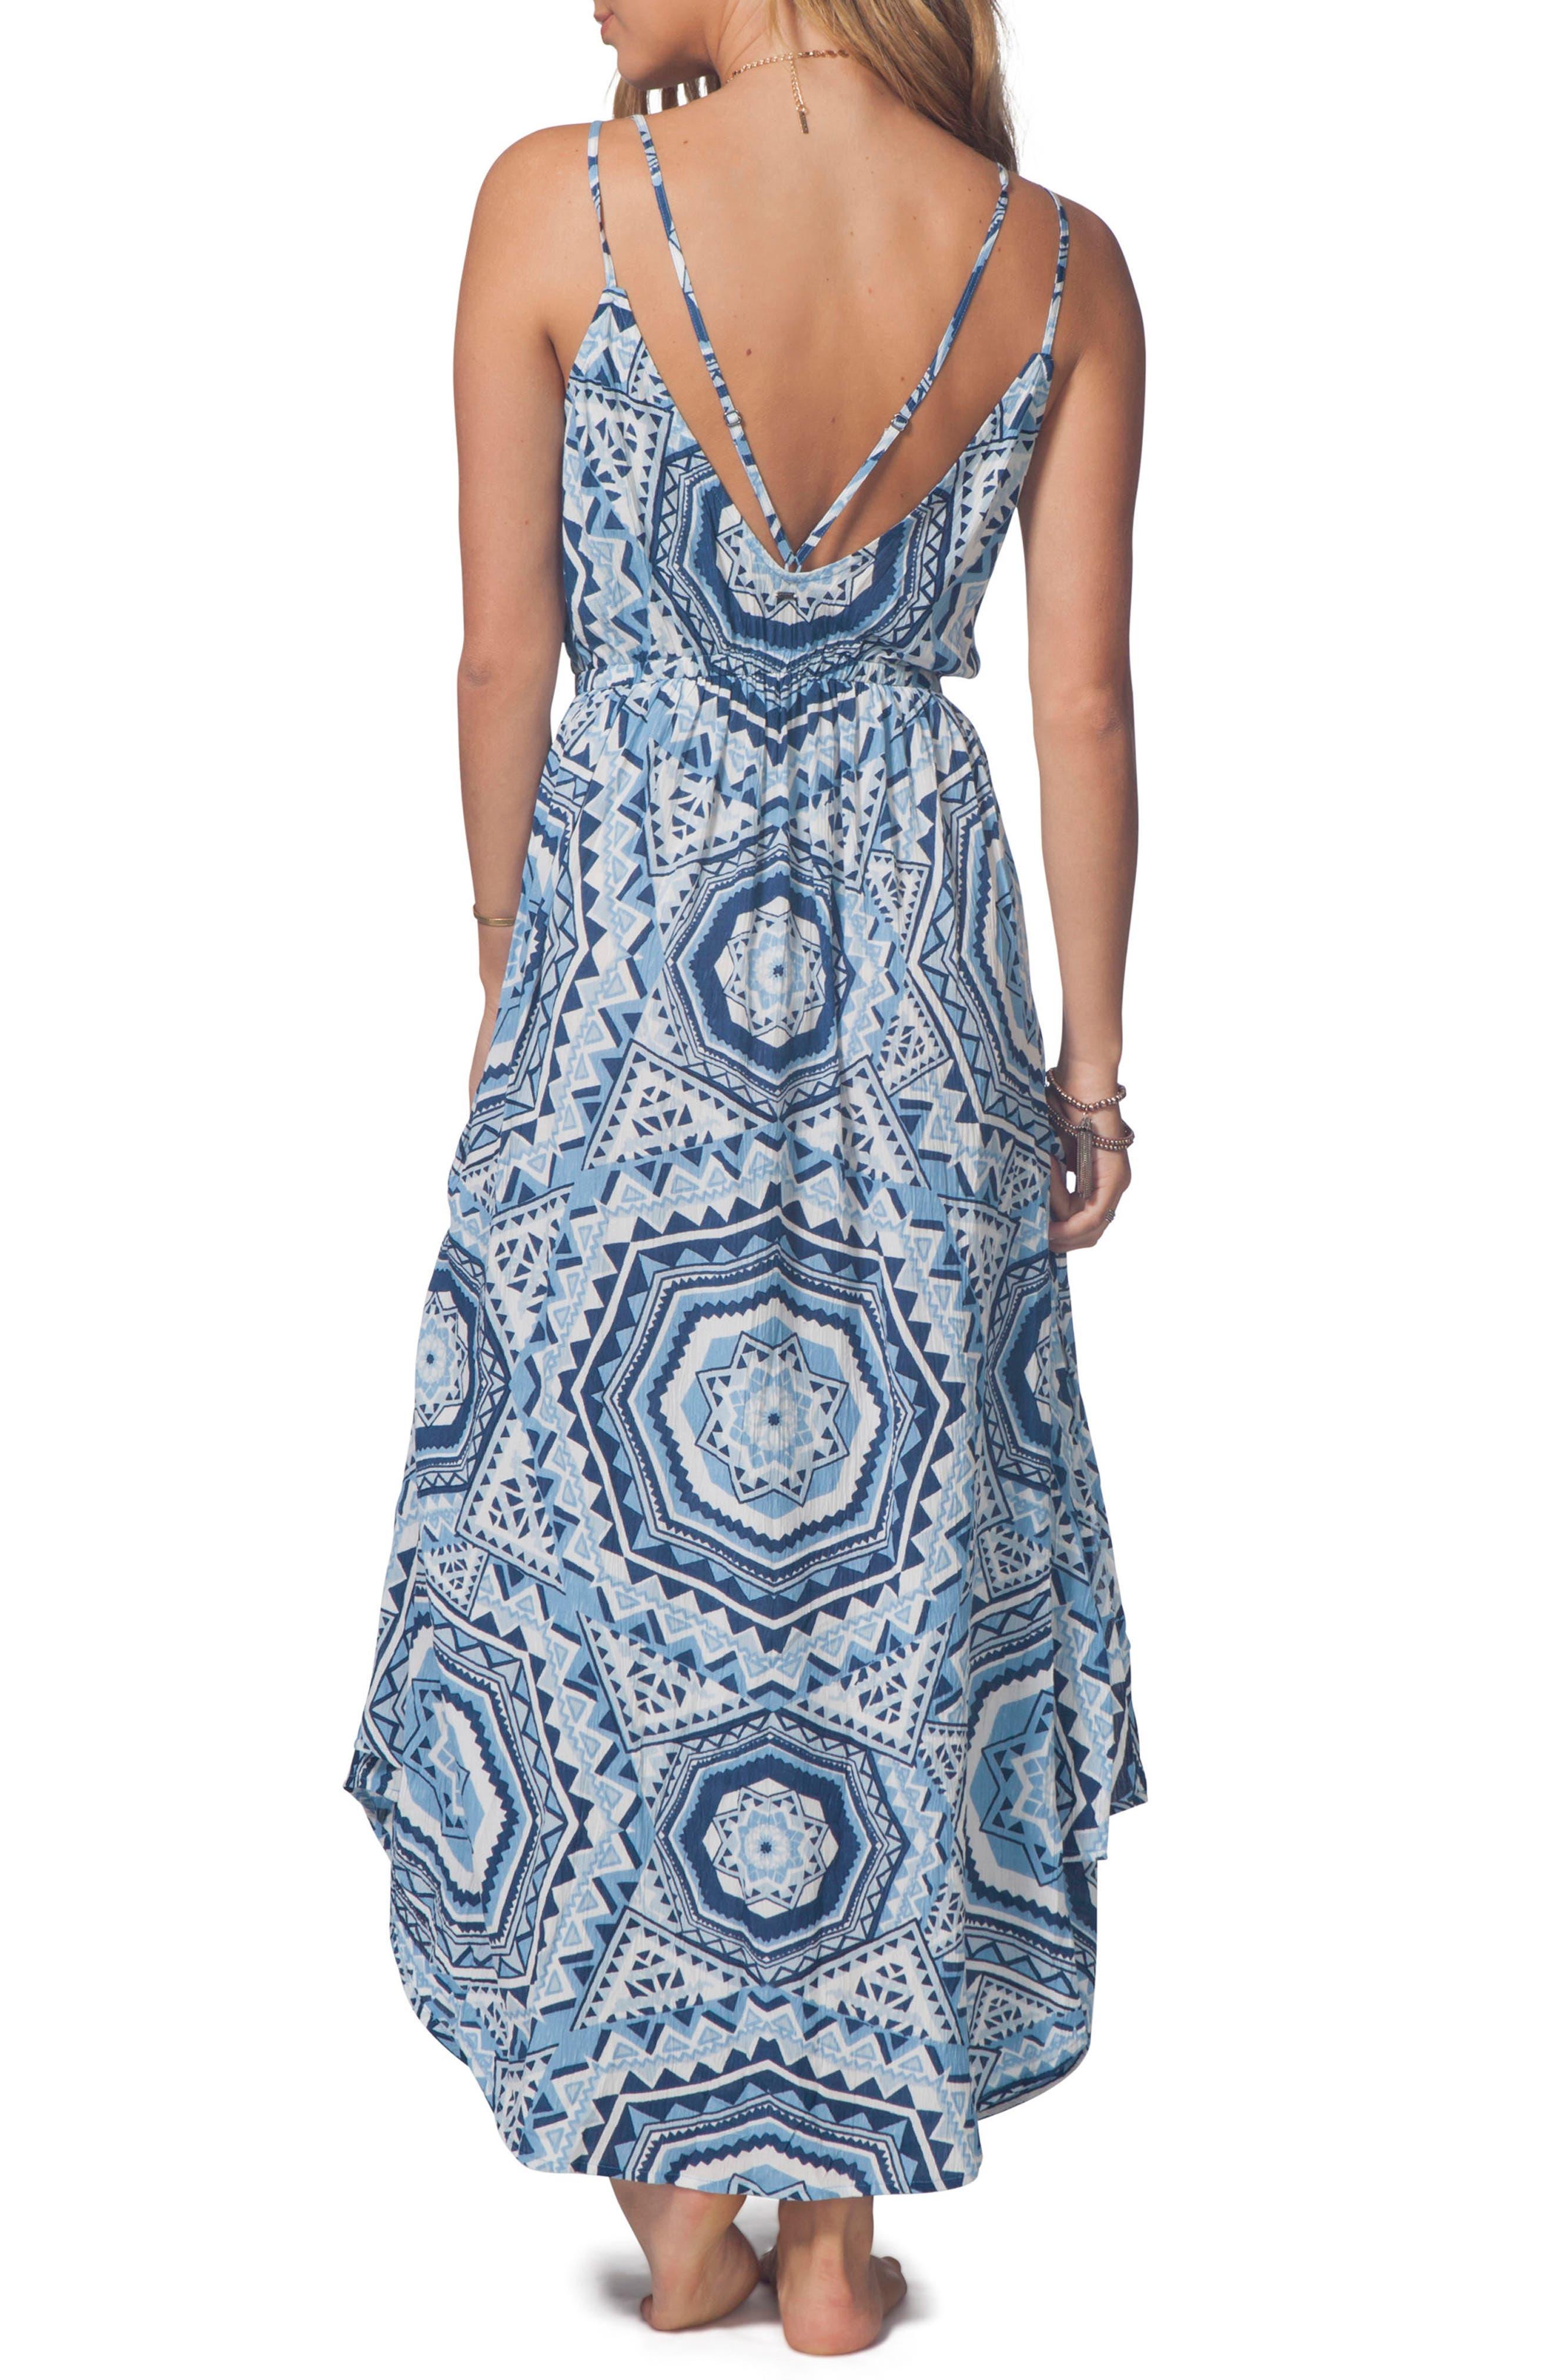 La Playa Maxi Dress,                             Alternate thumbnail 2, color,                             Mid Blue